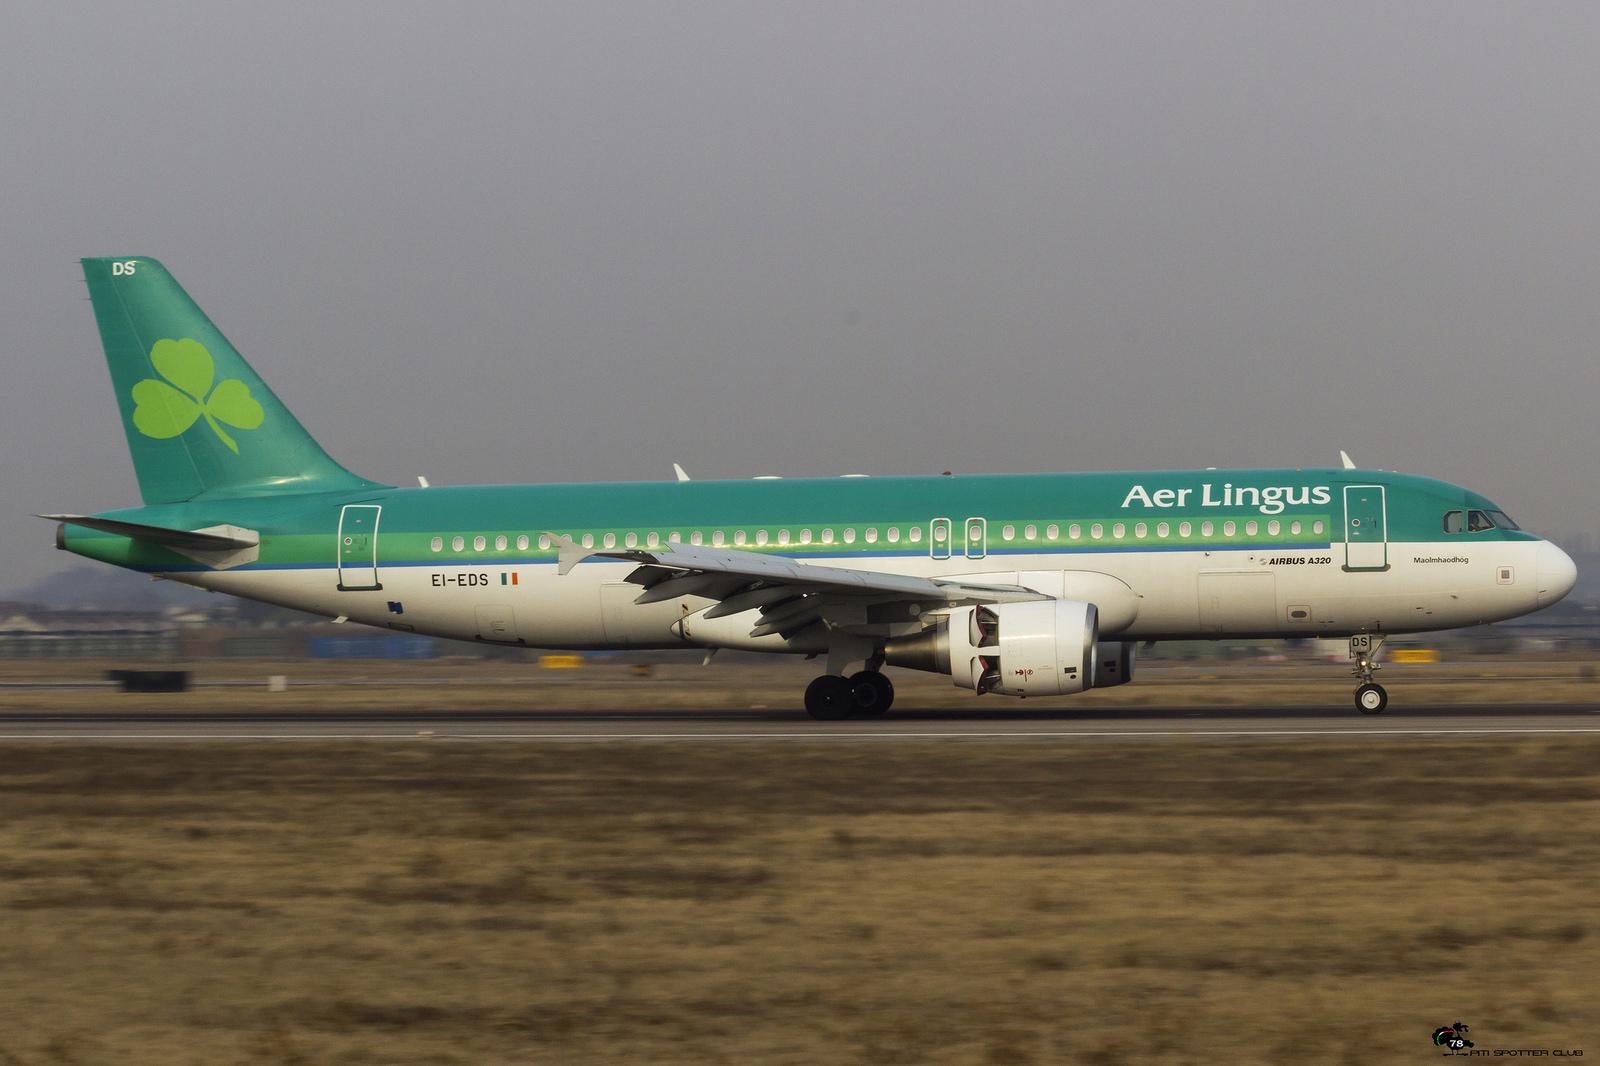 EI-EDS A320-214 3755 Aer Lingus @ Aeroporto di Verona - 28.01.2017  © Piti Spotter Club Verona